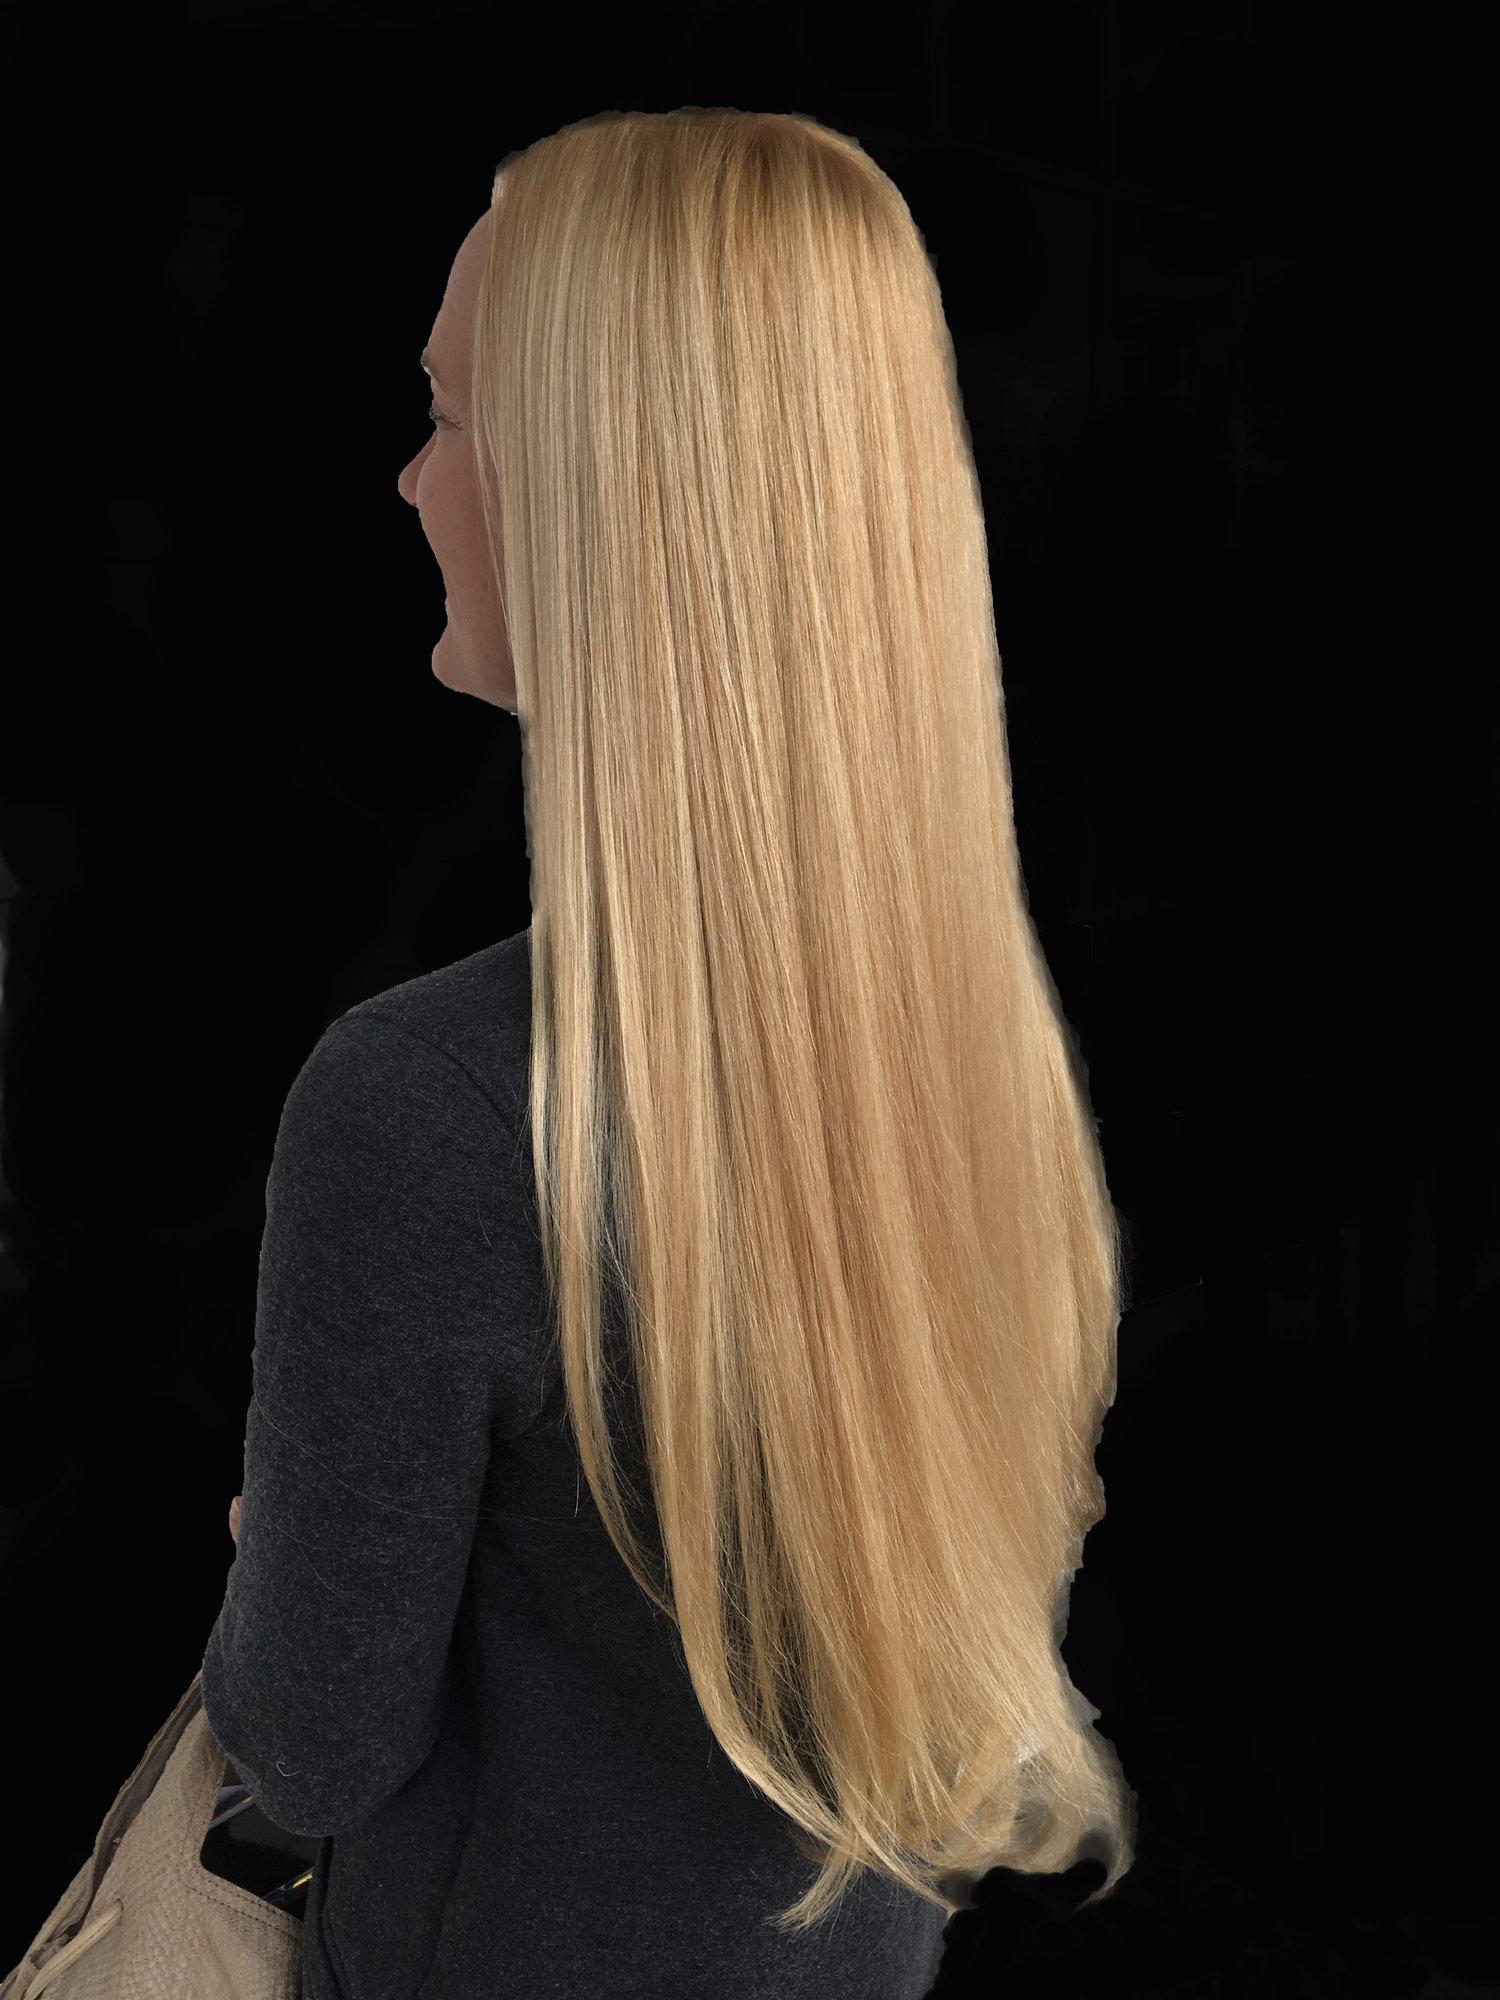 Gallery Medium Long Hair Hair Is Art